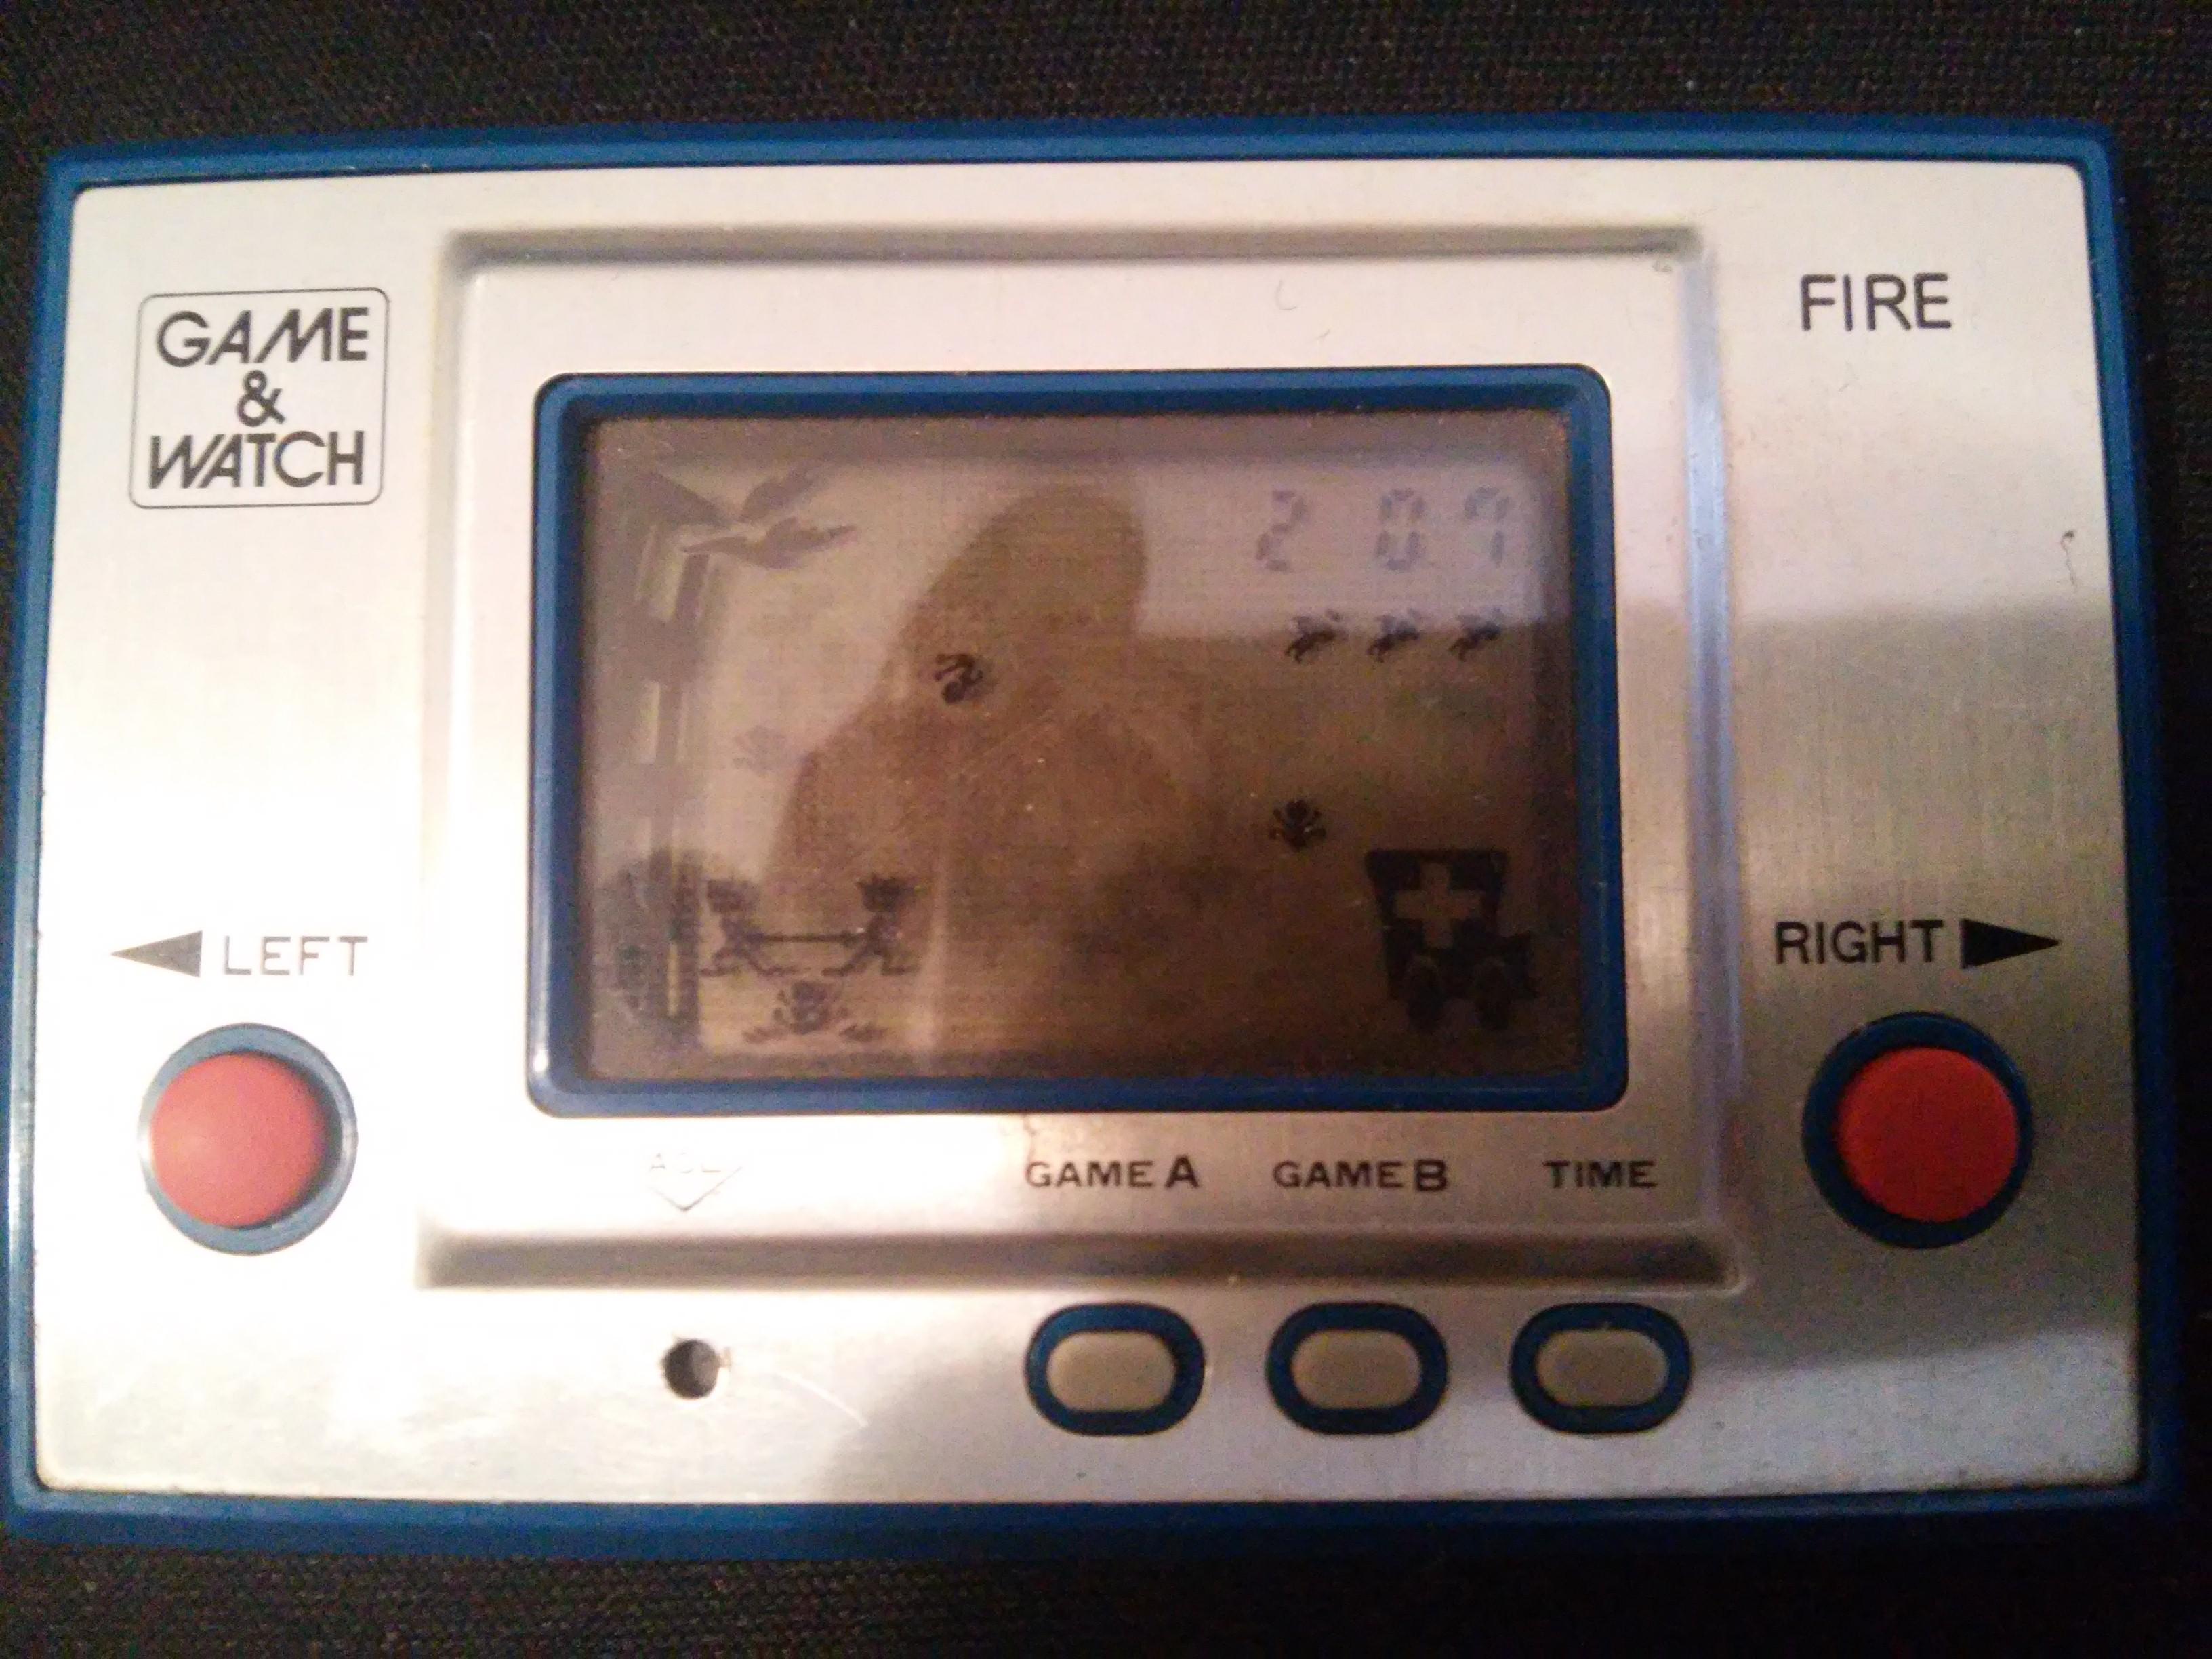 zerooskul: Game & Watch: Fire [aka Fireman Fireman] [Game B] (Dedicated Handheld) 207 points on 2019-01-05 13:23:16